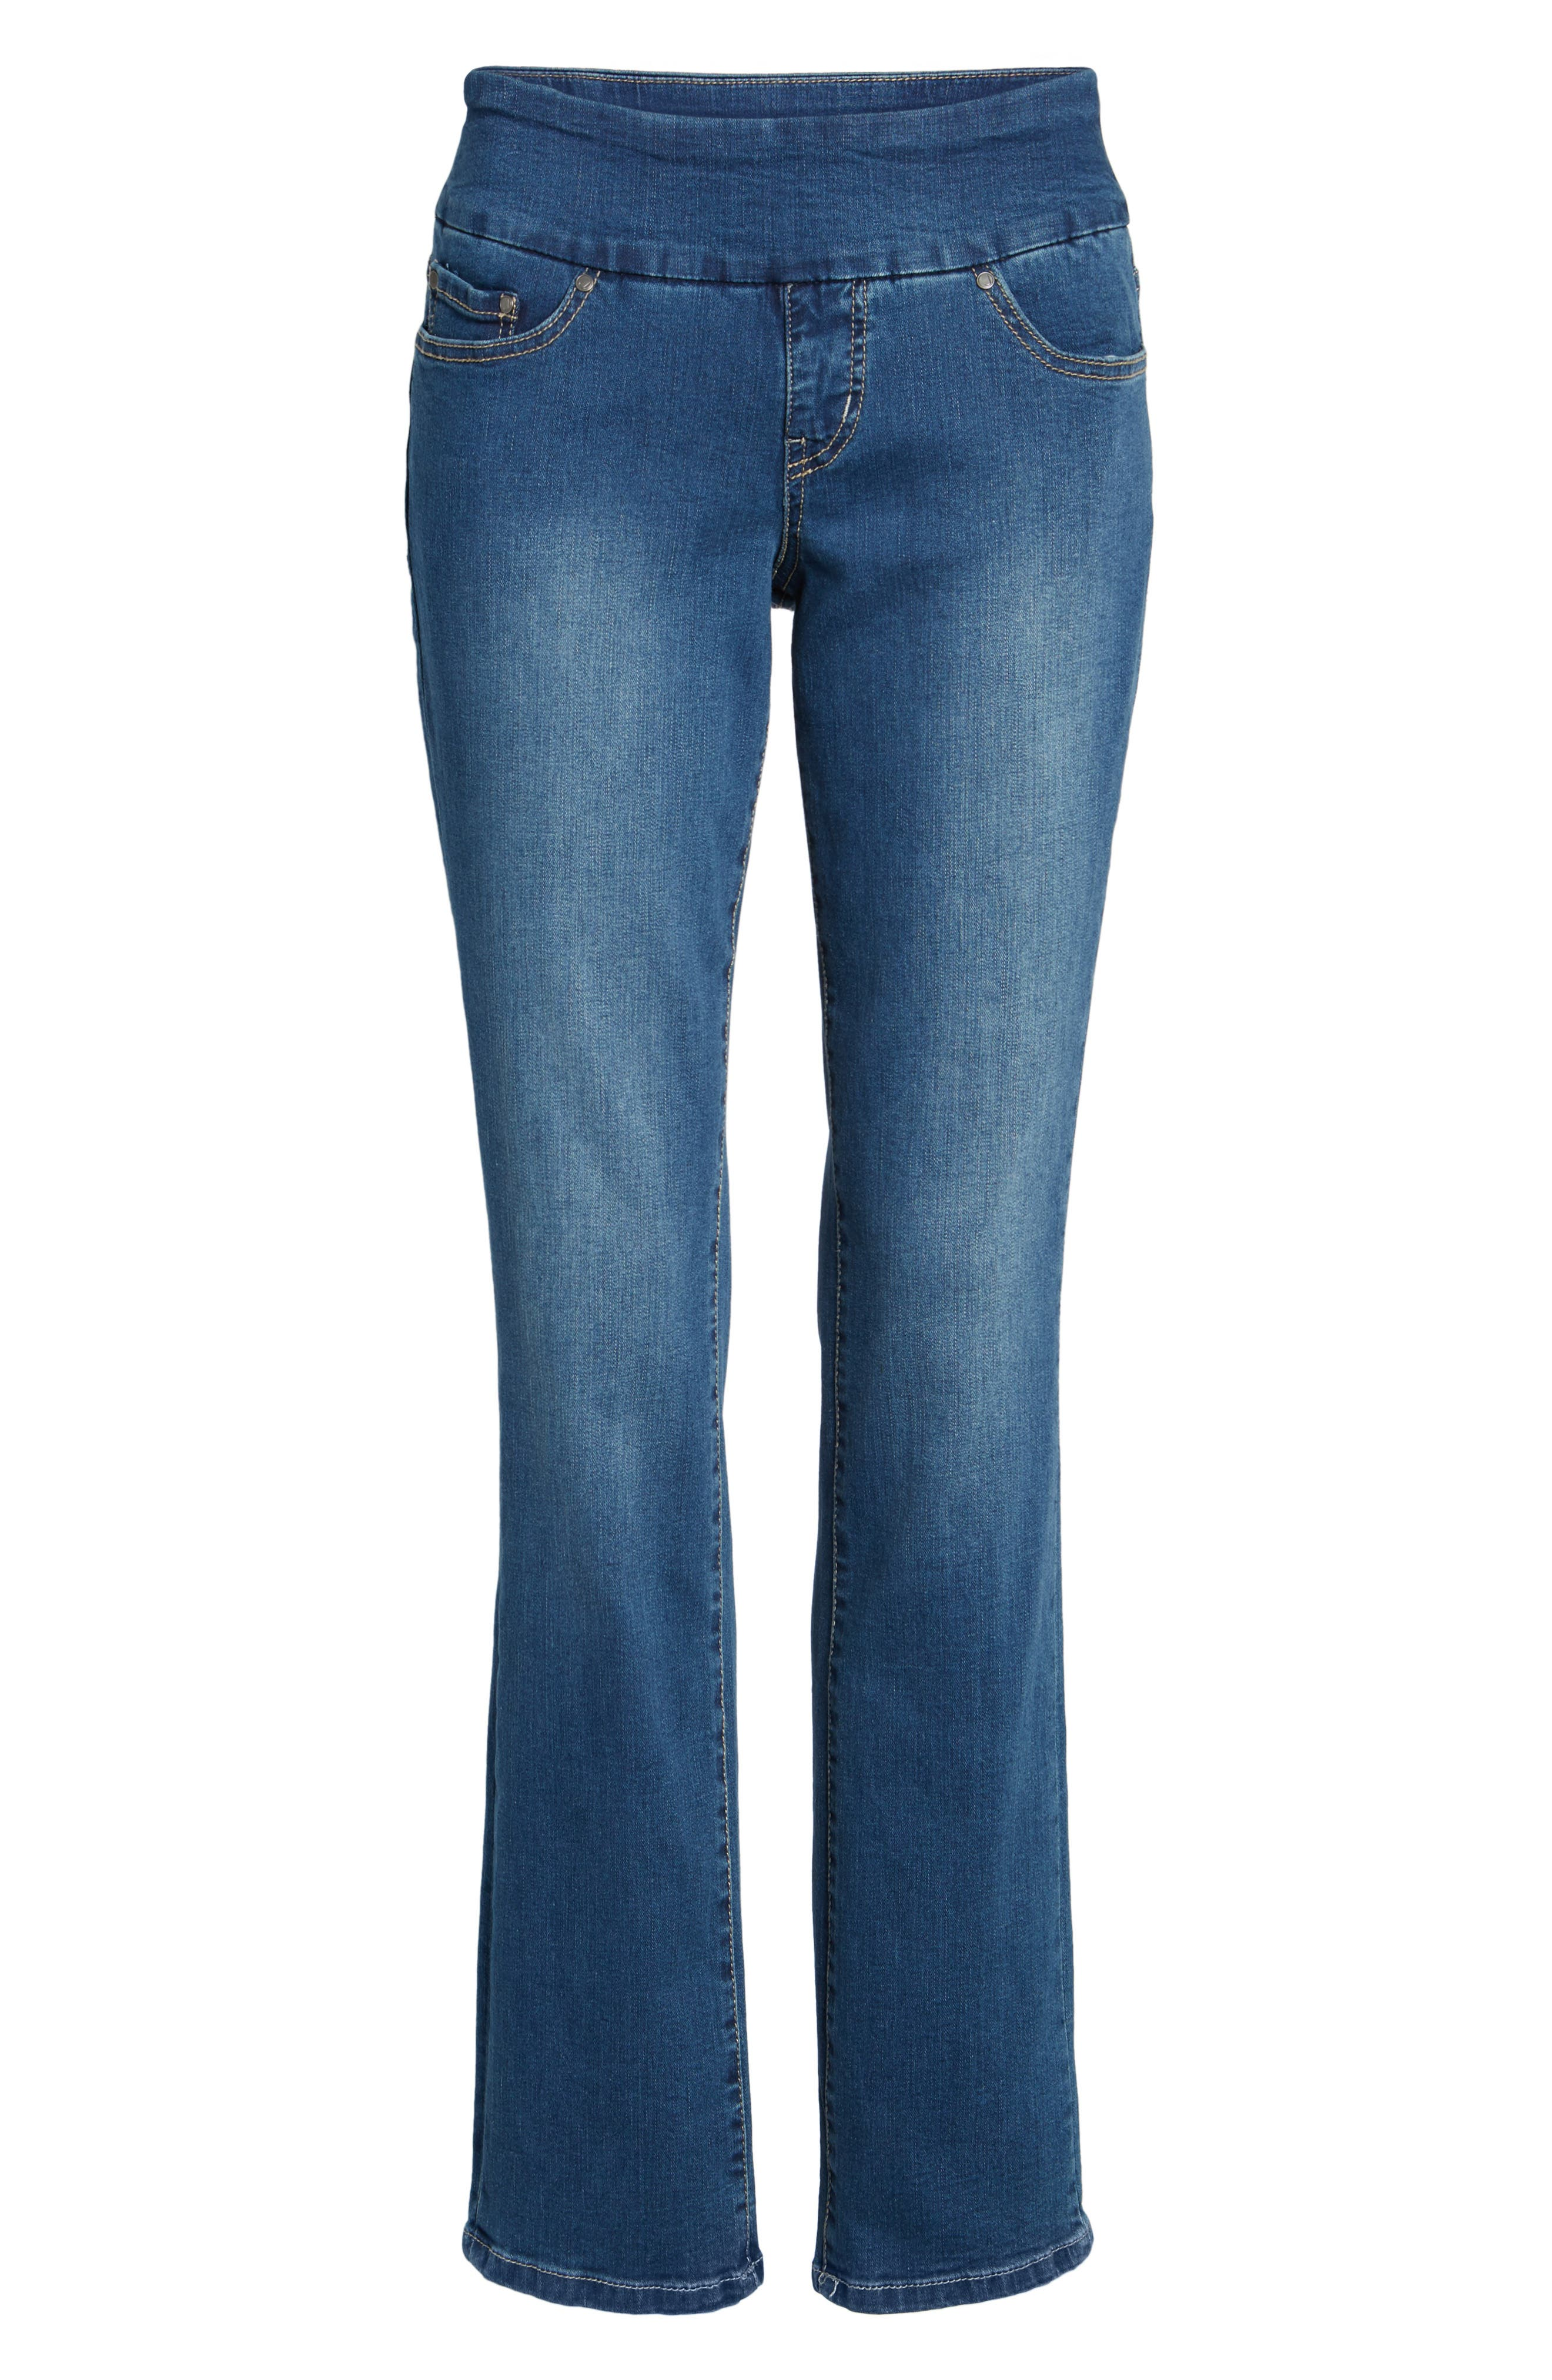 Peri Pull-On Straight Leg Jeans,                             Alternate thumbnail 6, color,                             MEDIUM INDIGO